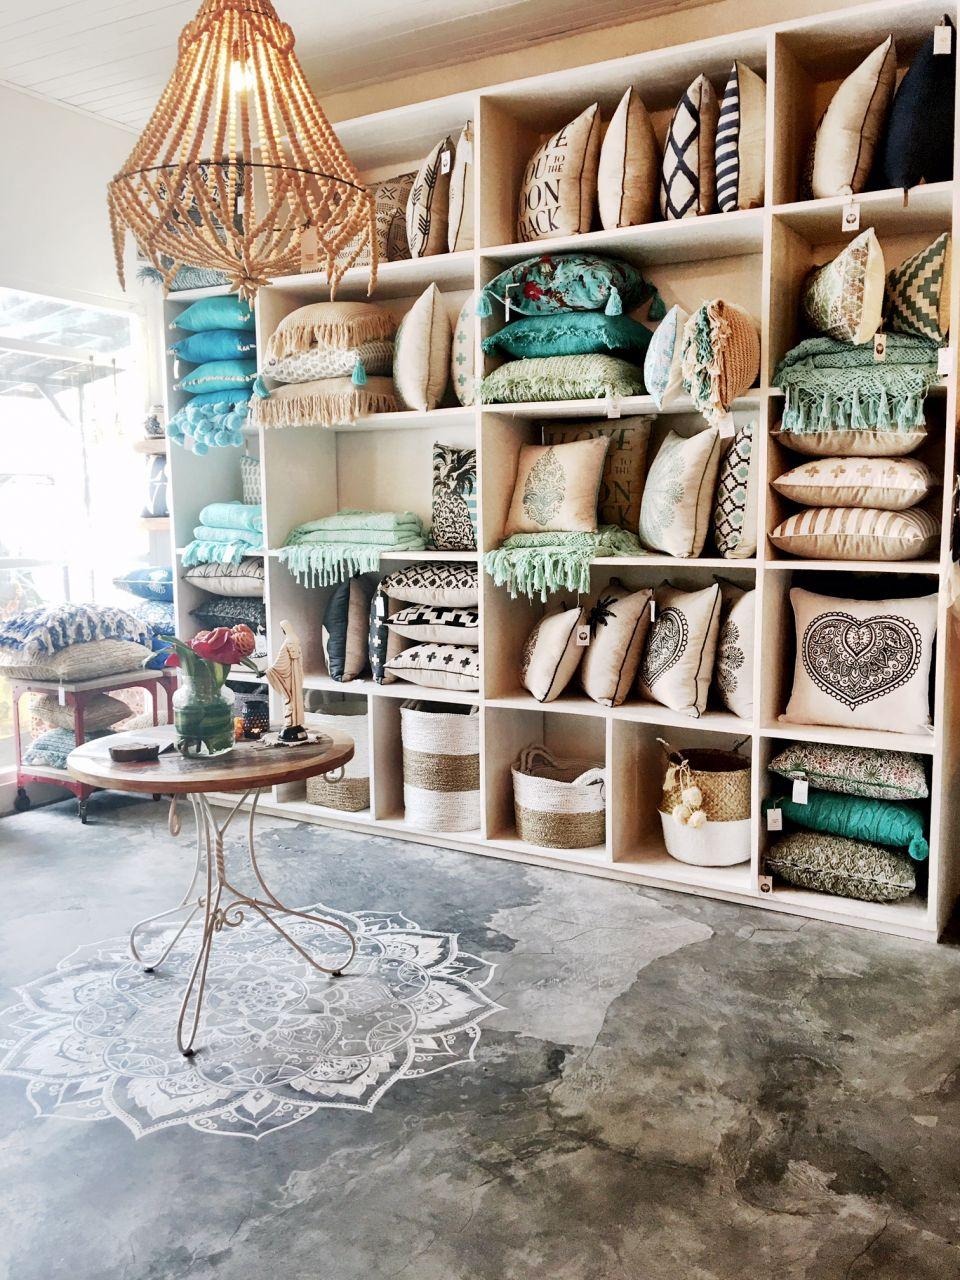 Bungalow living bali interiors for Cheap homeware decor